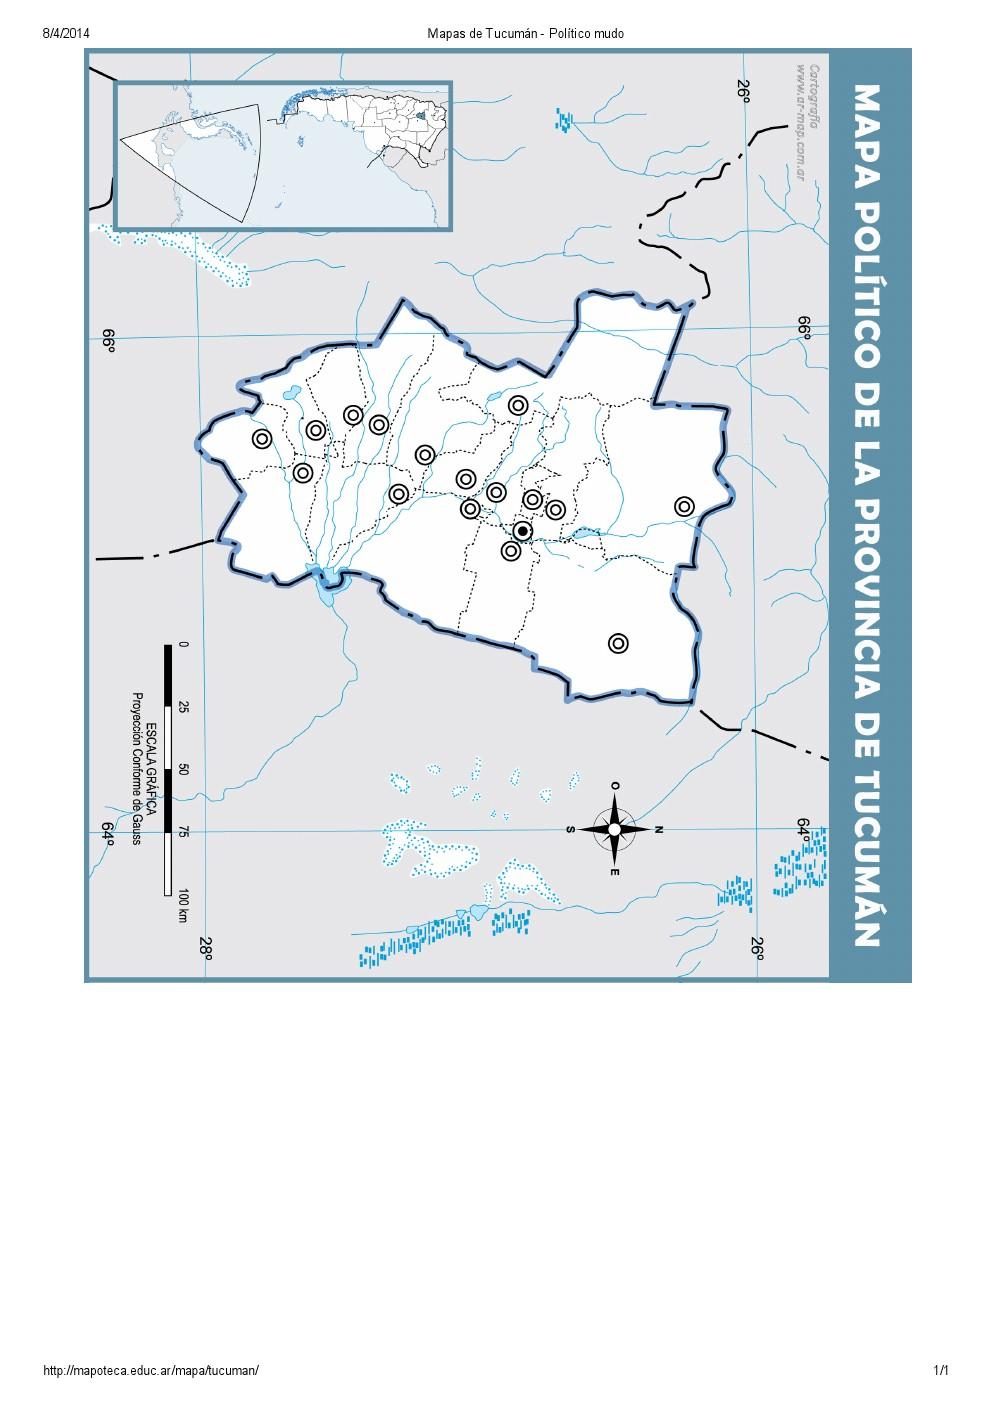 Mapa mudo de capitales de Tucumán. Mapoteca de Educ.ar